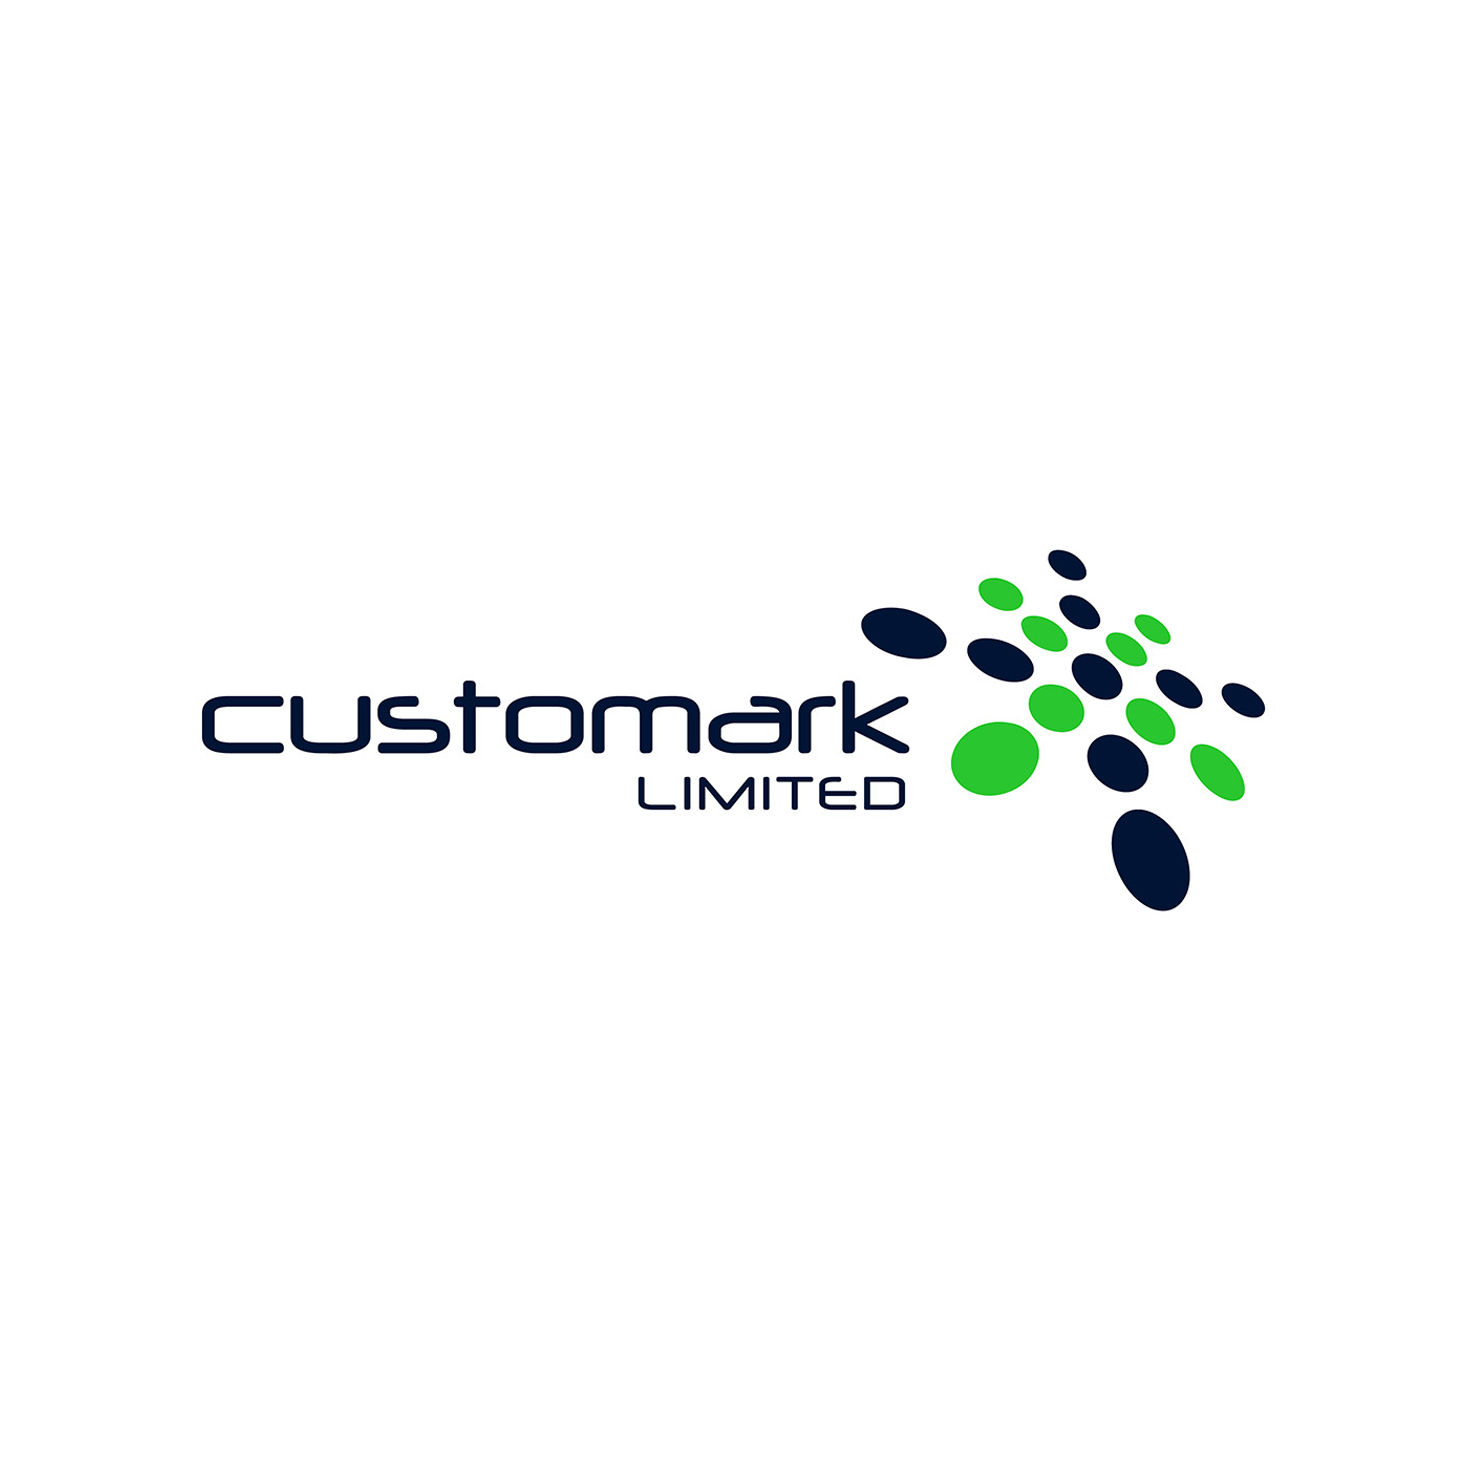 Customark